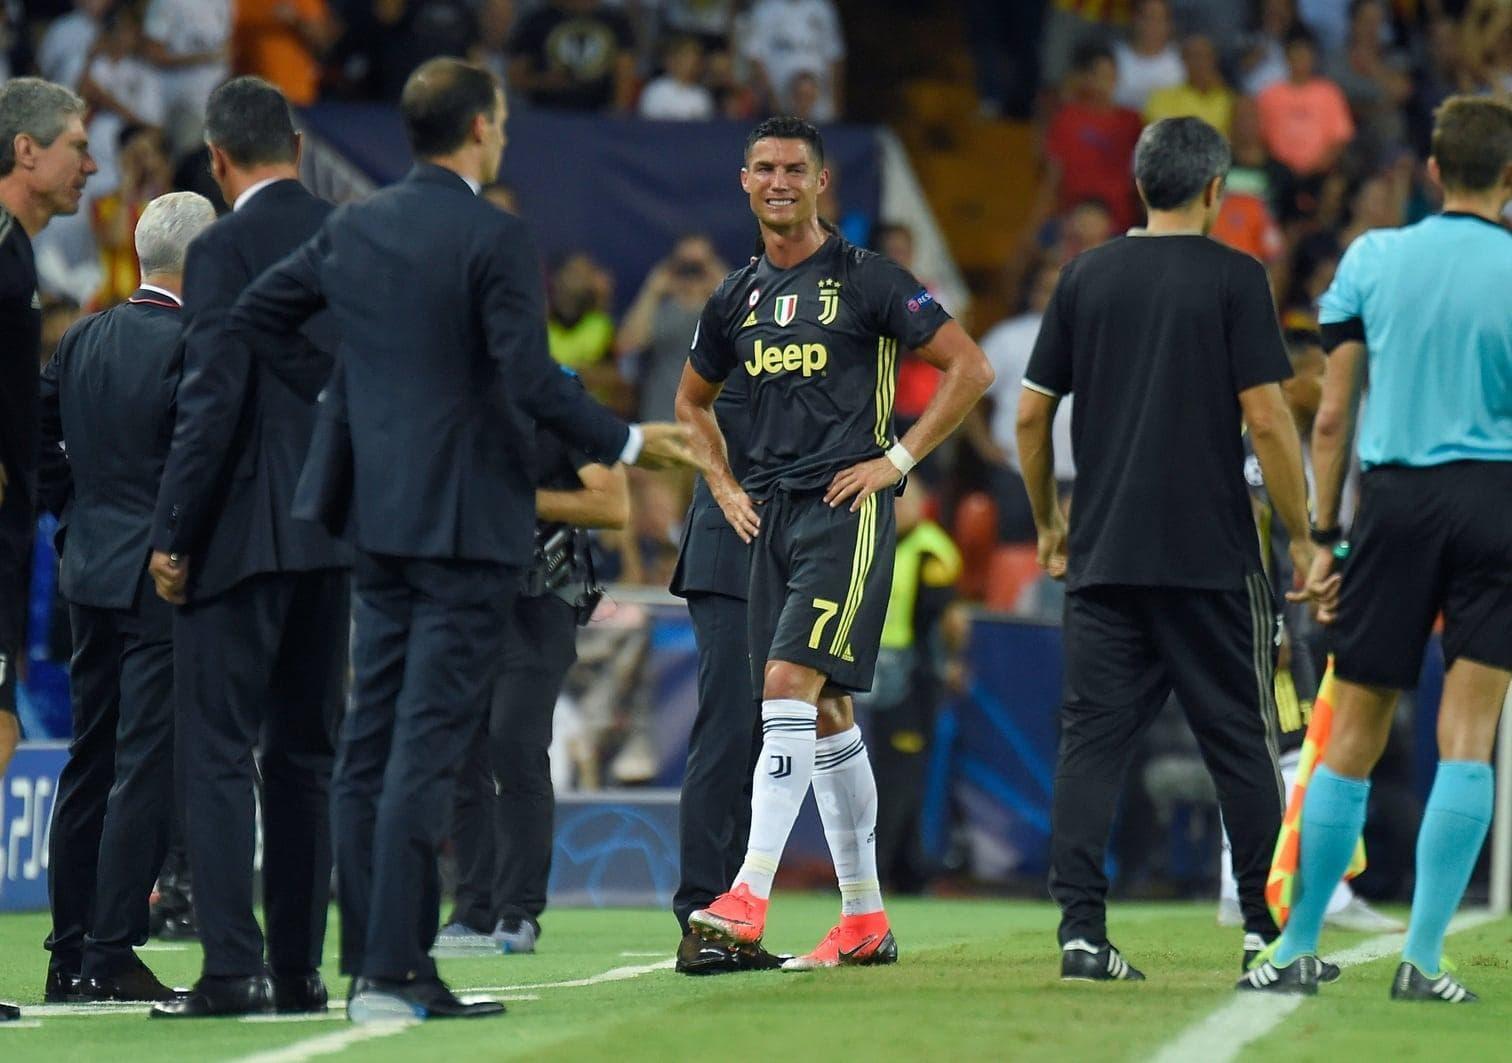 dass Ronaldo das Match gegen seinen ehemaligen Club Manchester United nächsten Monat verpasst.</p> Foto: AFP